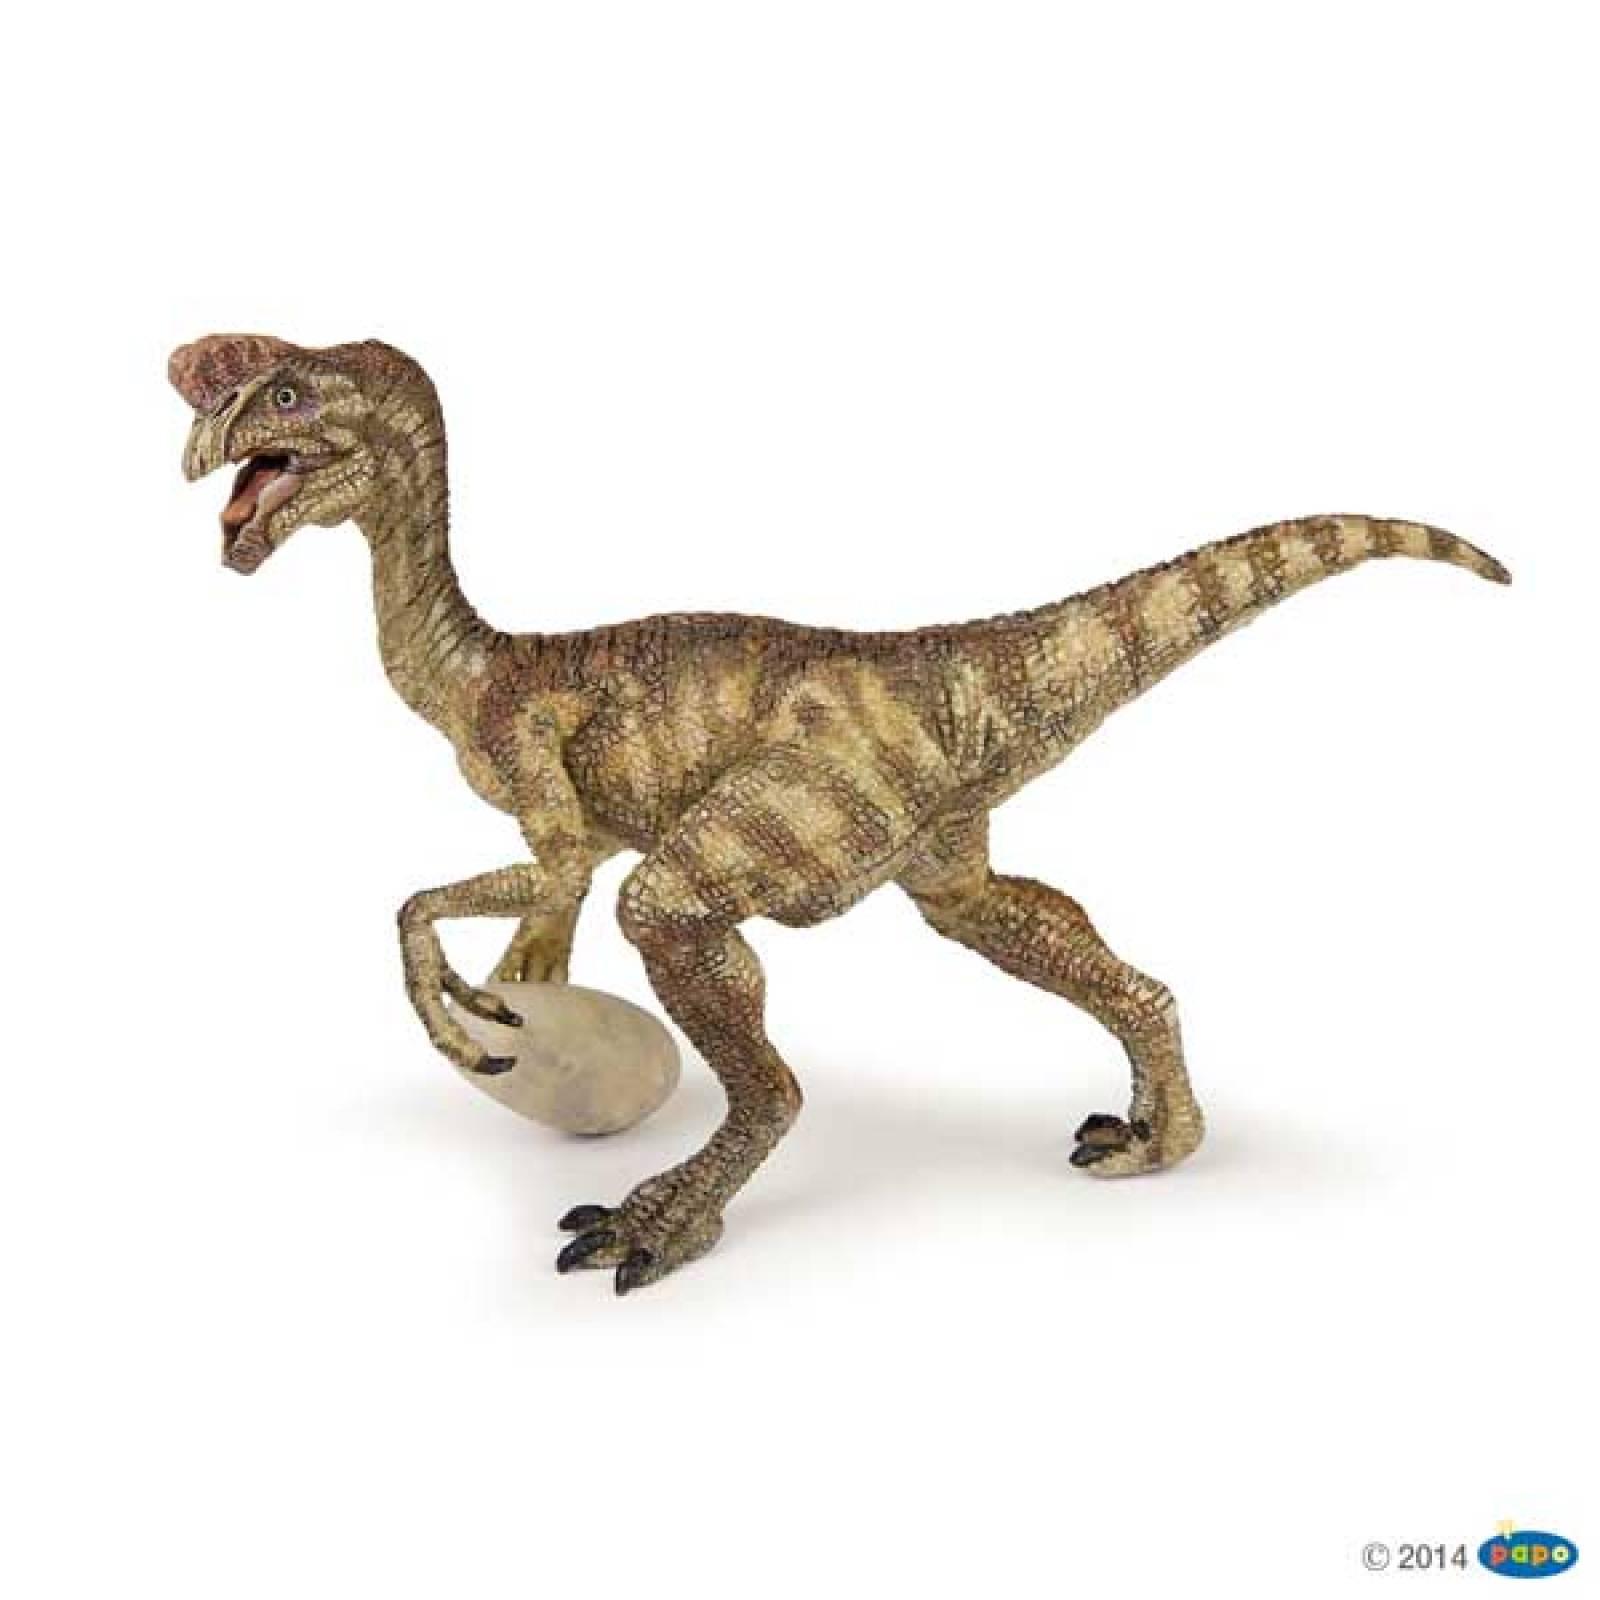 Oviraptor - Papo Dinosaur Figure